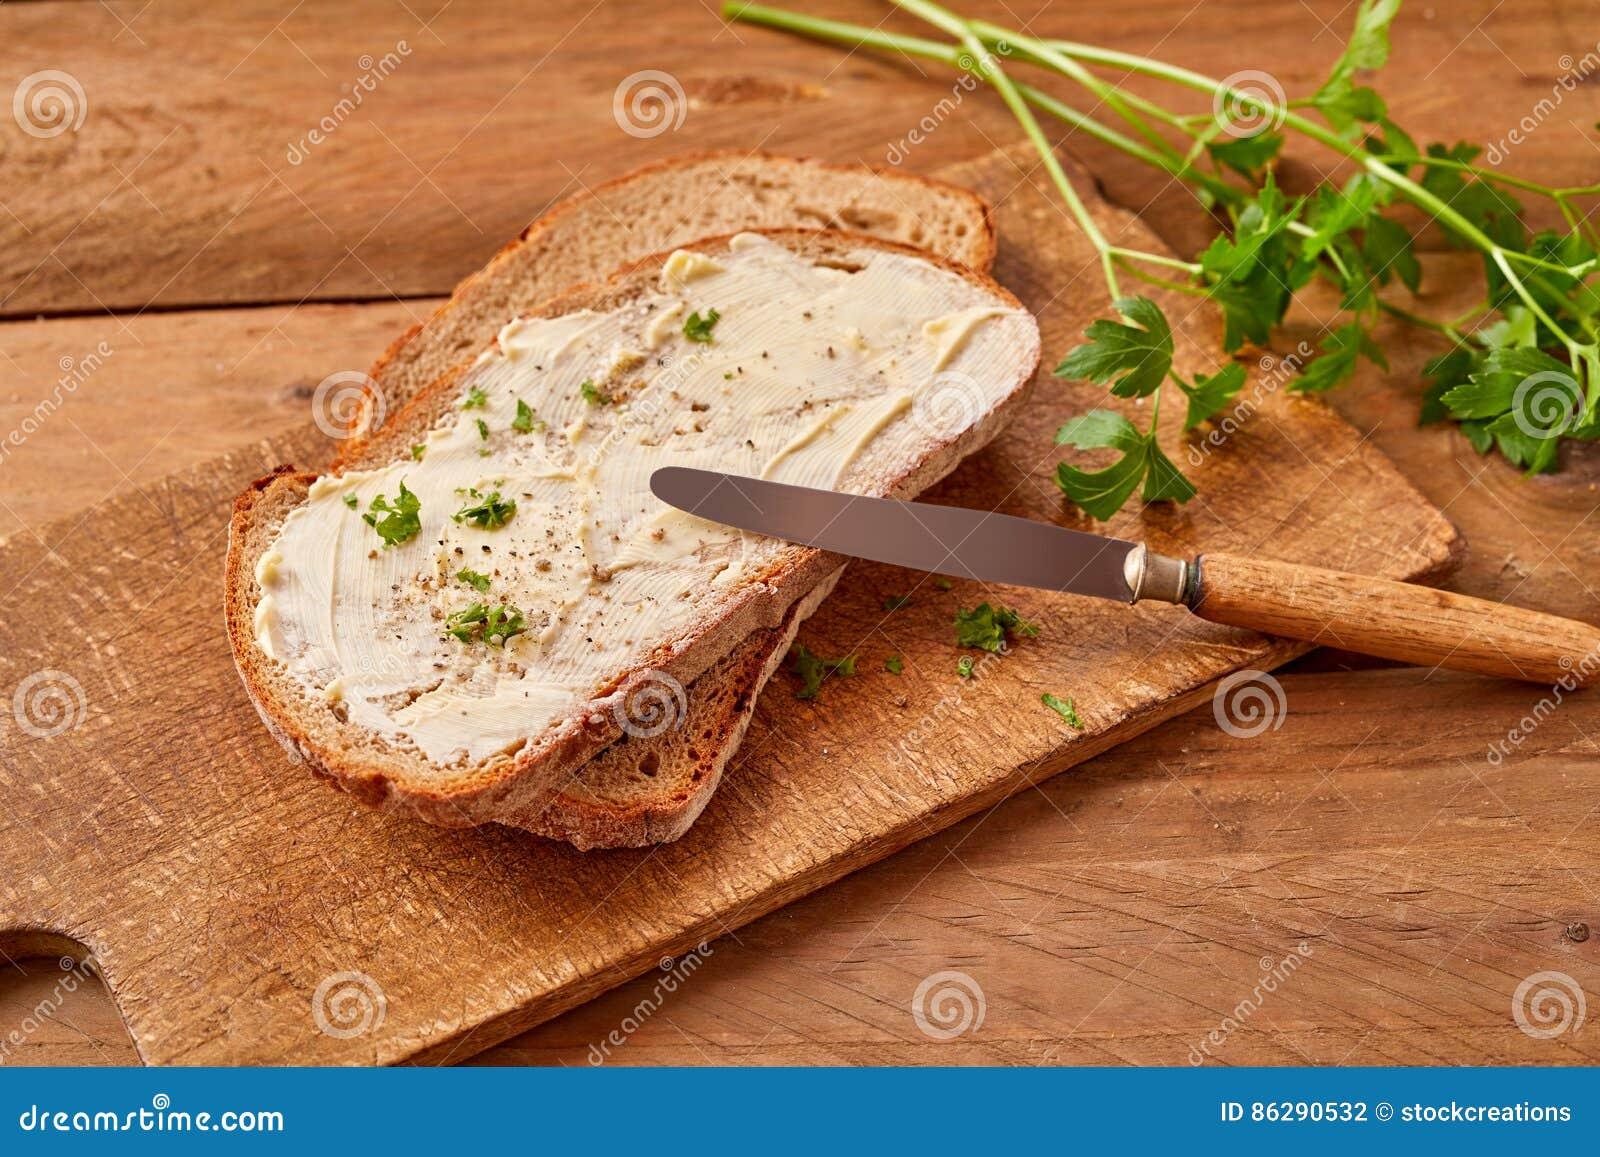 Gesneden beboterd brood met verse peterselie